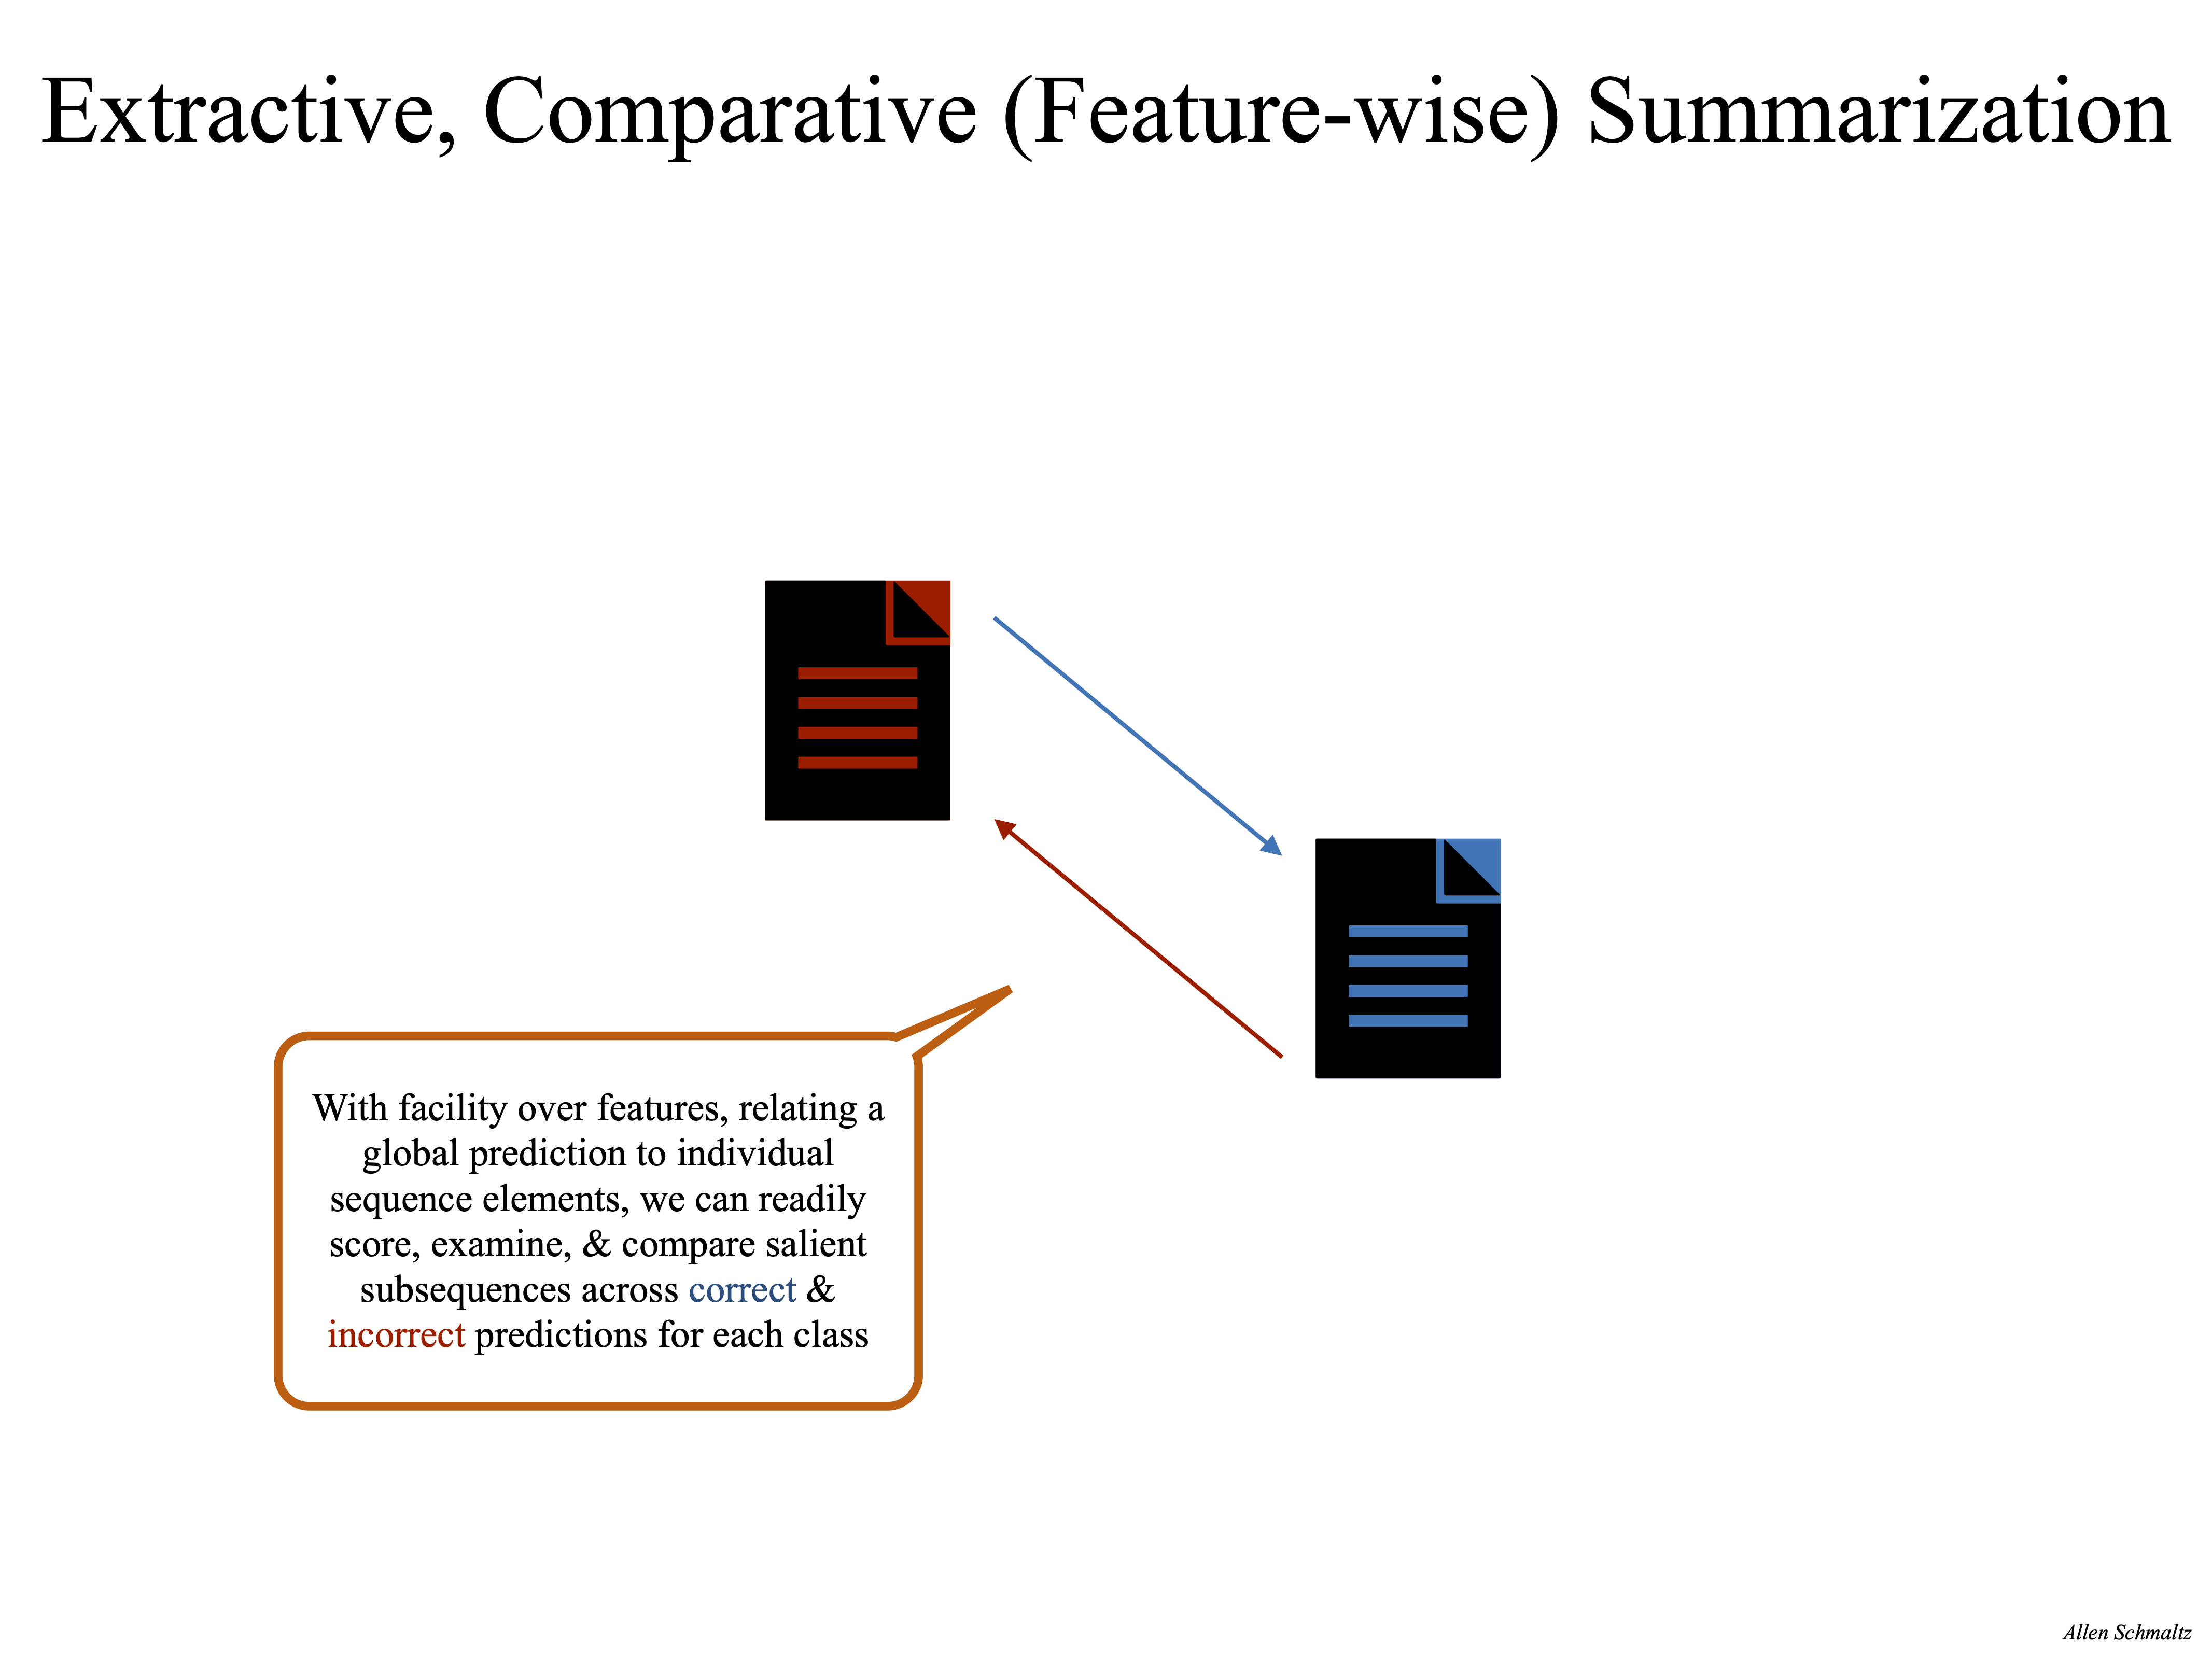 Comparative Feature-wise Summarization